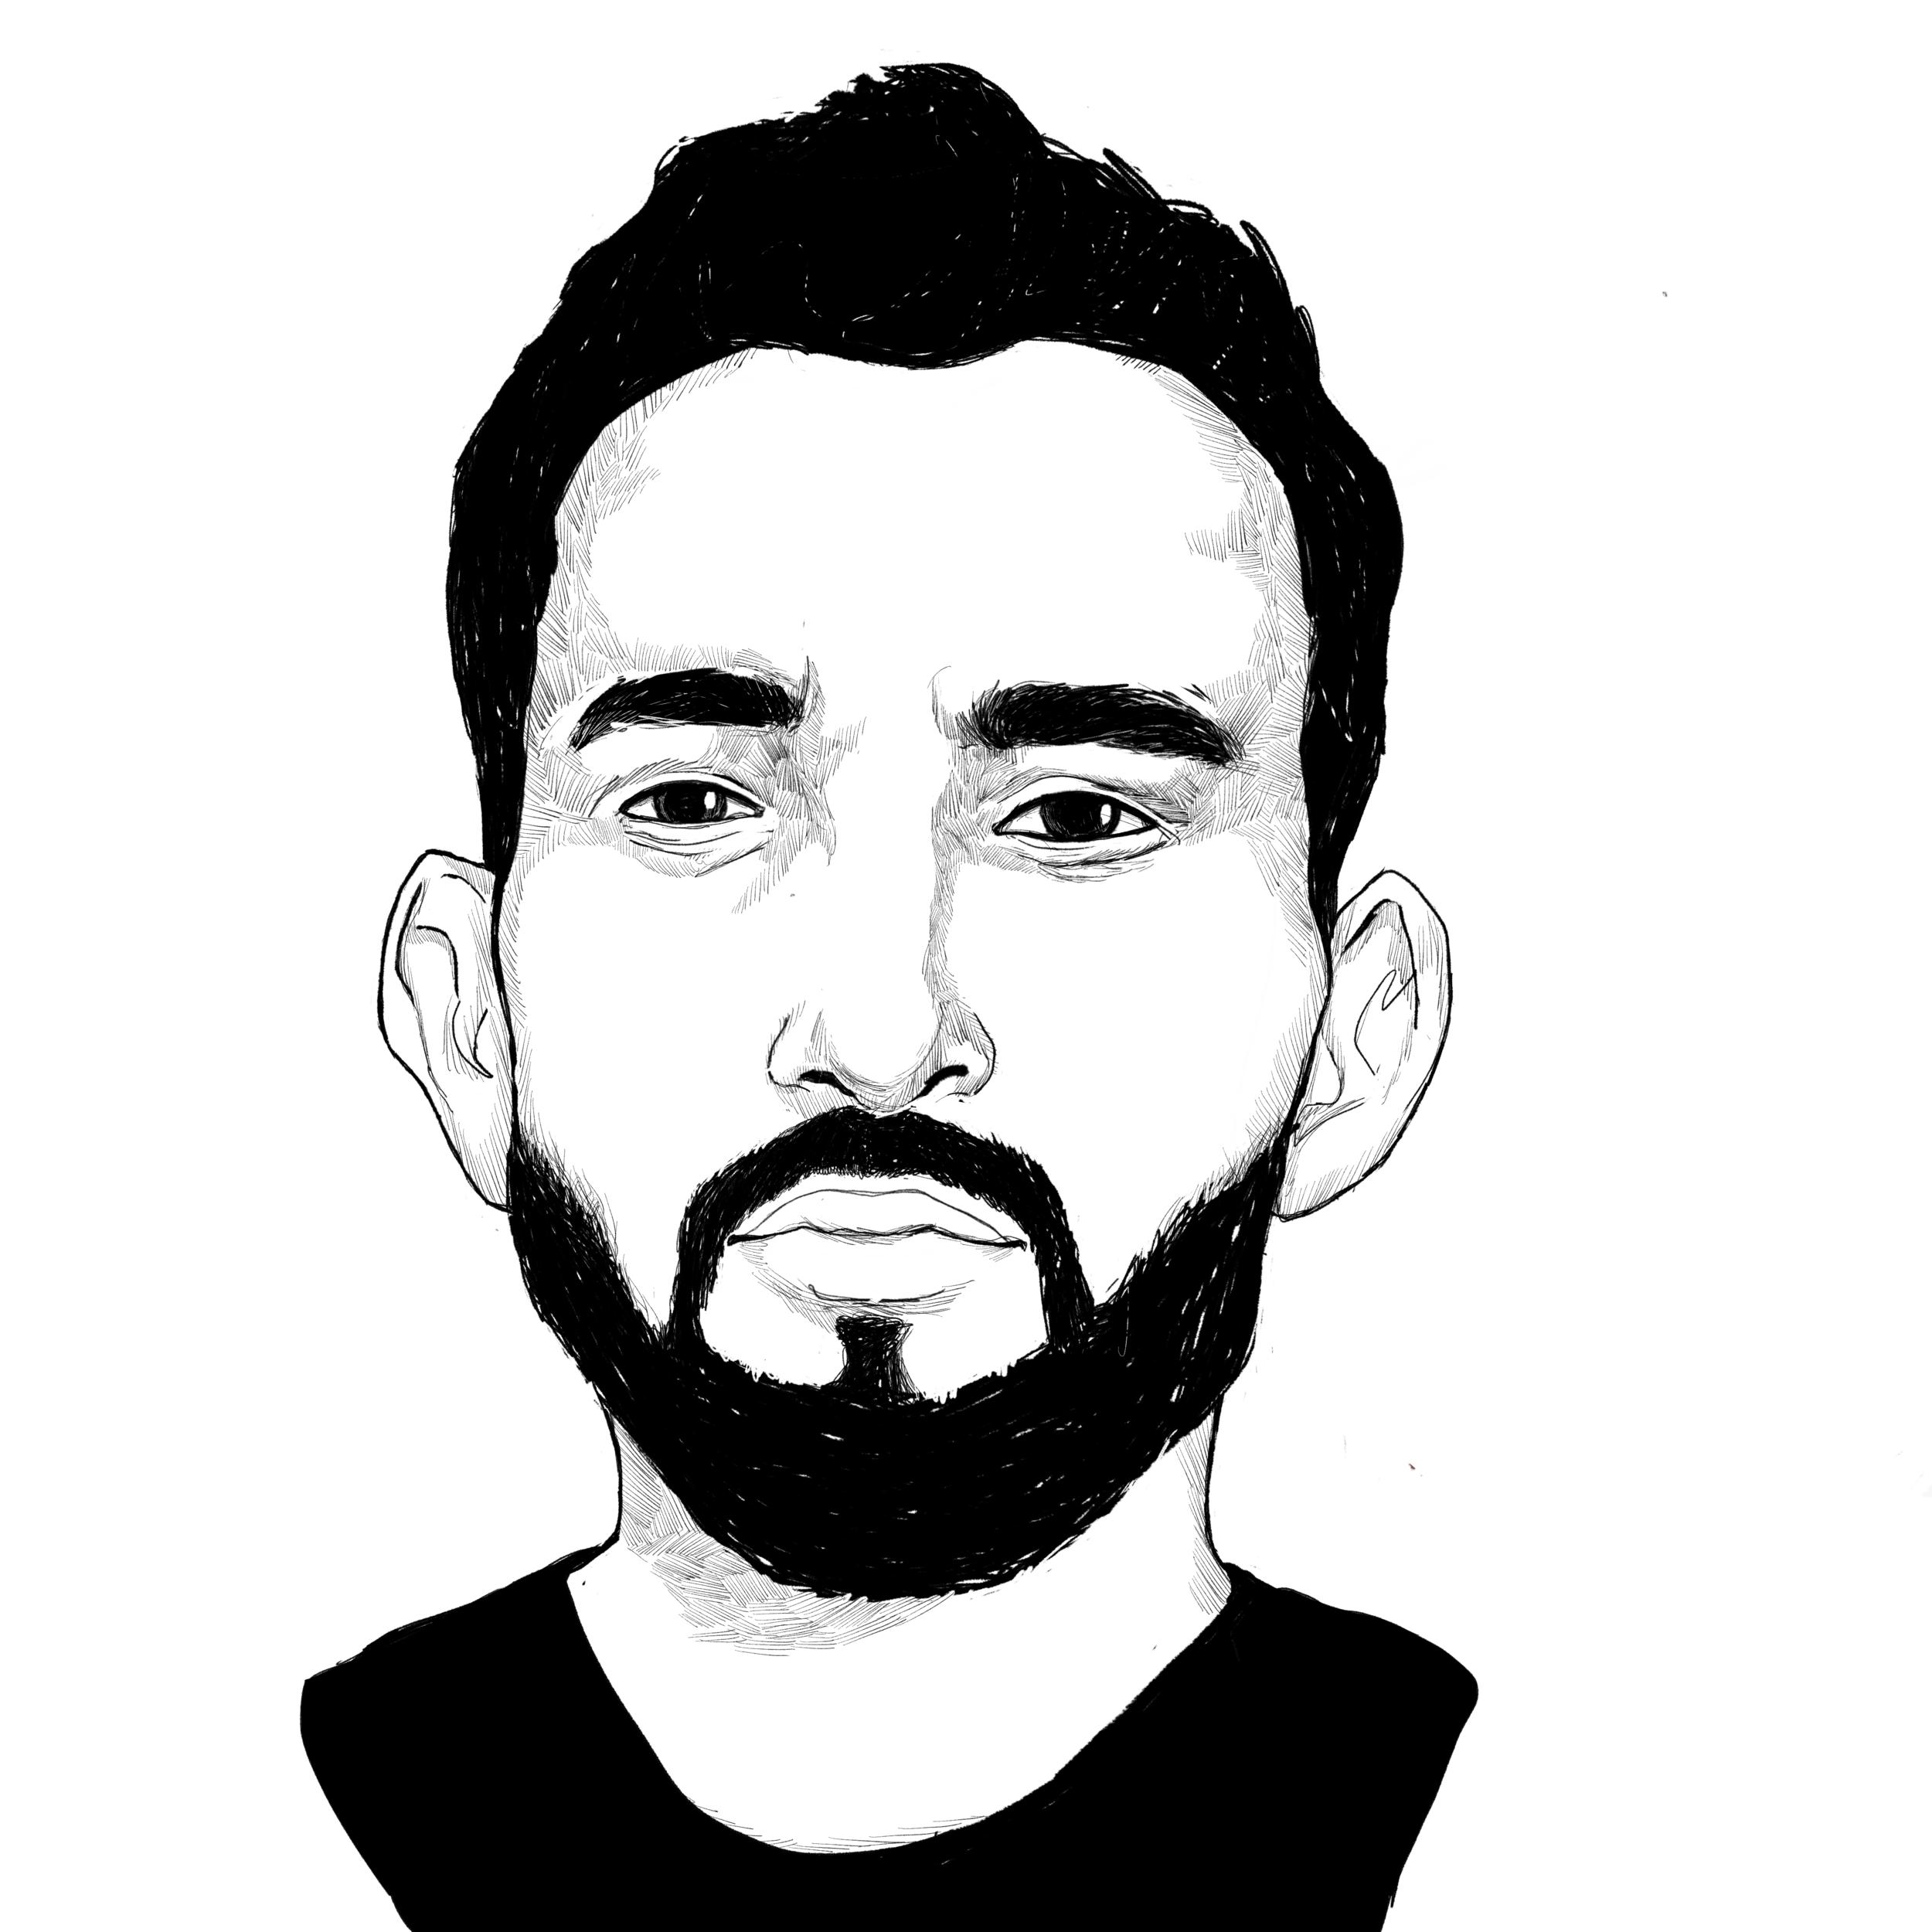 NADIM CHOUFIRESEARCHER - Nadim Choufi is an artist that currently resides in Lebanon.website • twitter • instagram